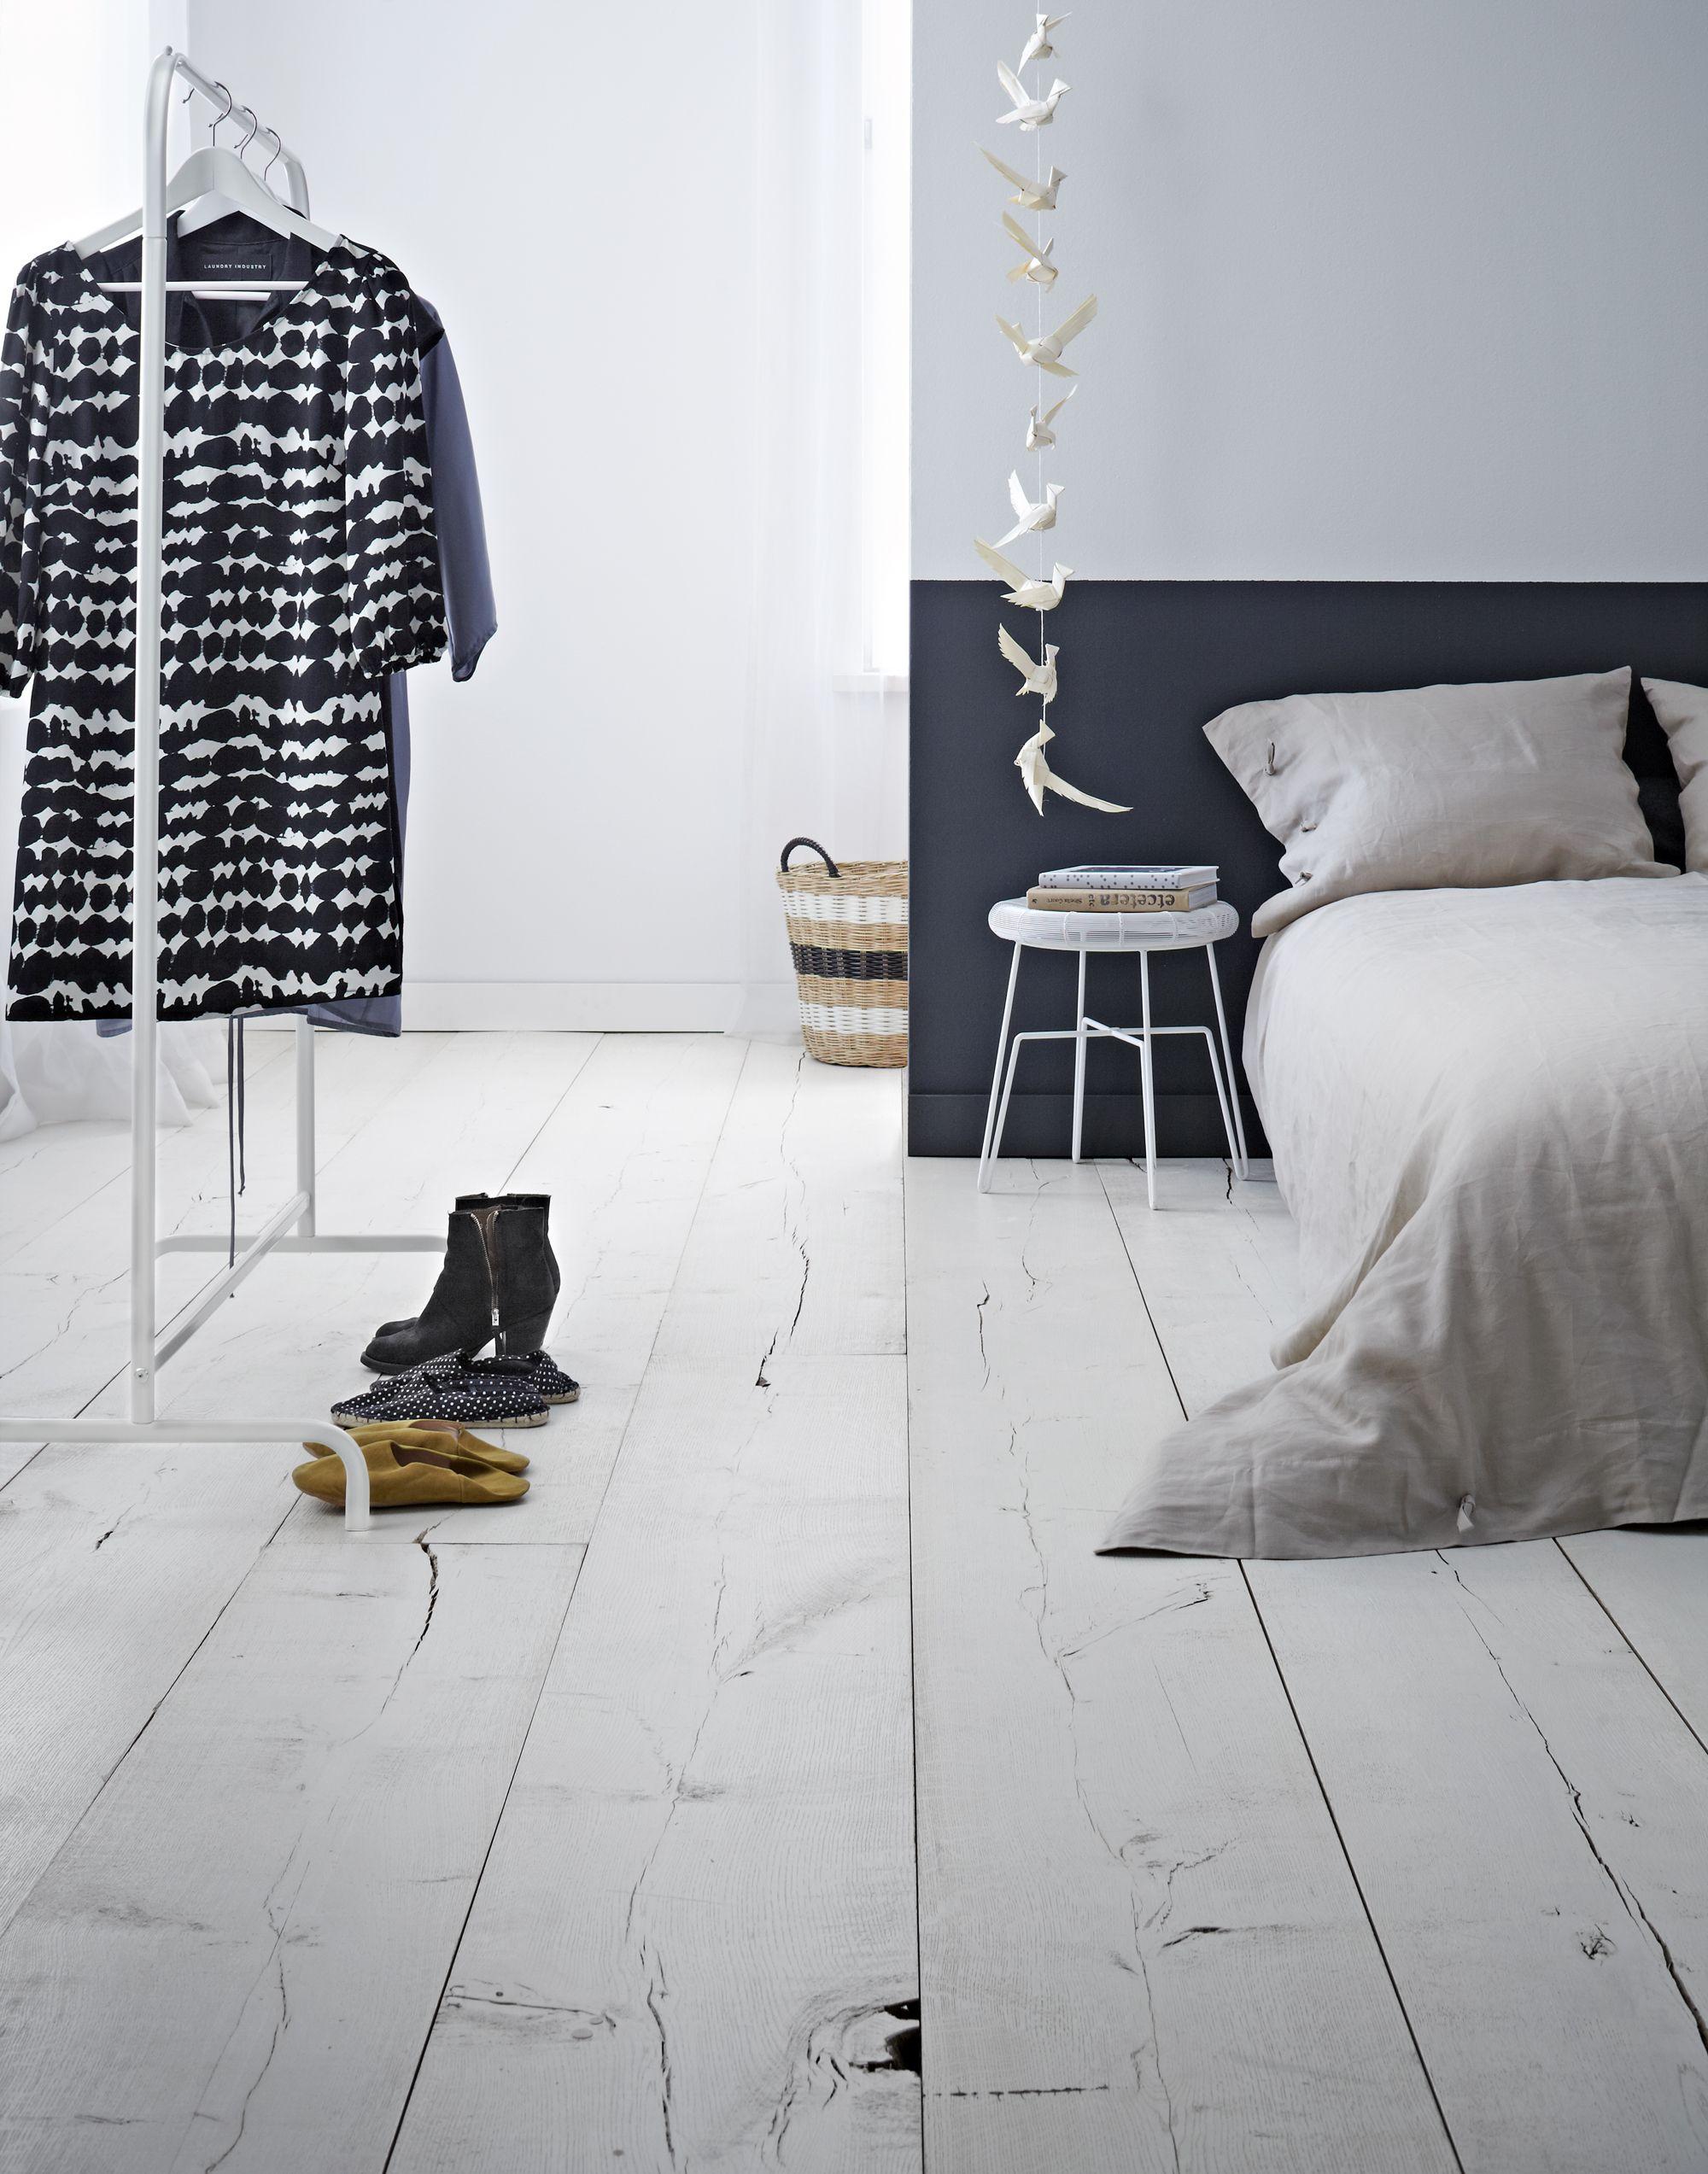 witte vloer in de slaapkamer. | slaapkamer | pinterest | painted, Deco ideeën